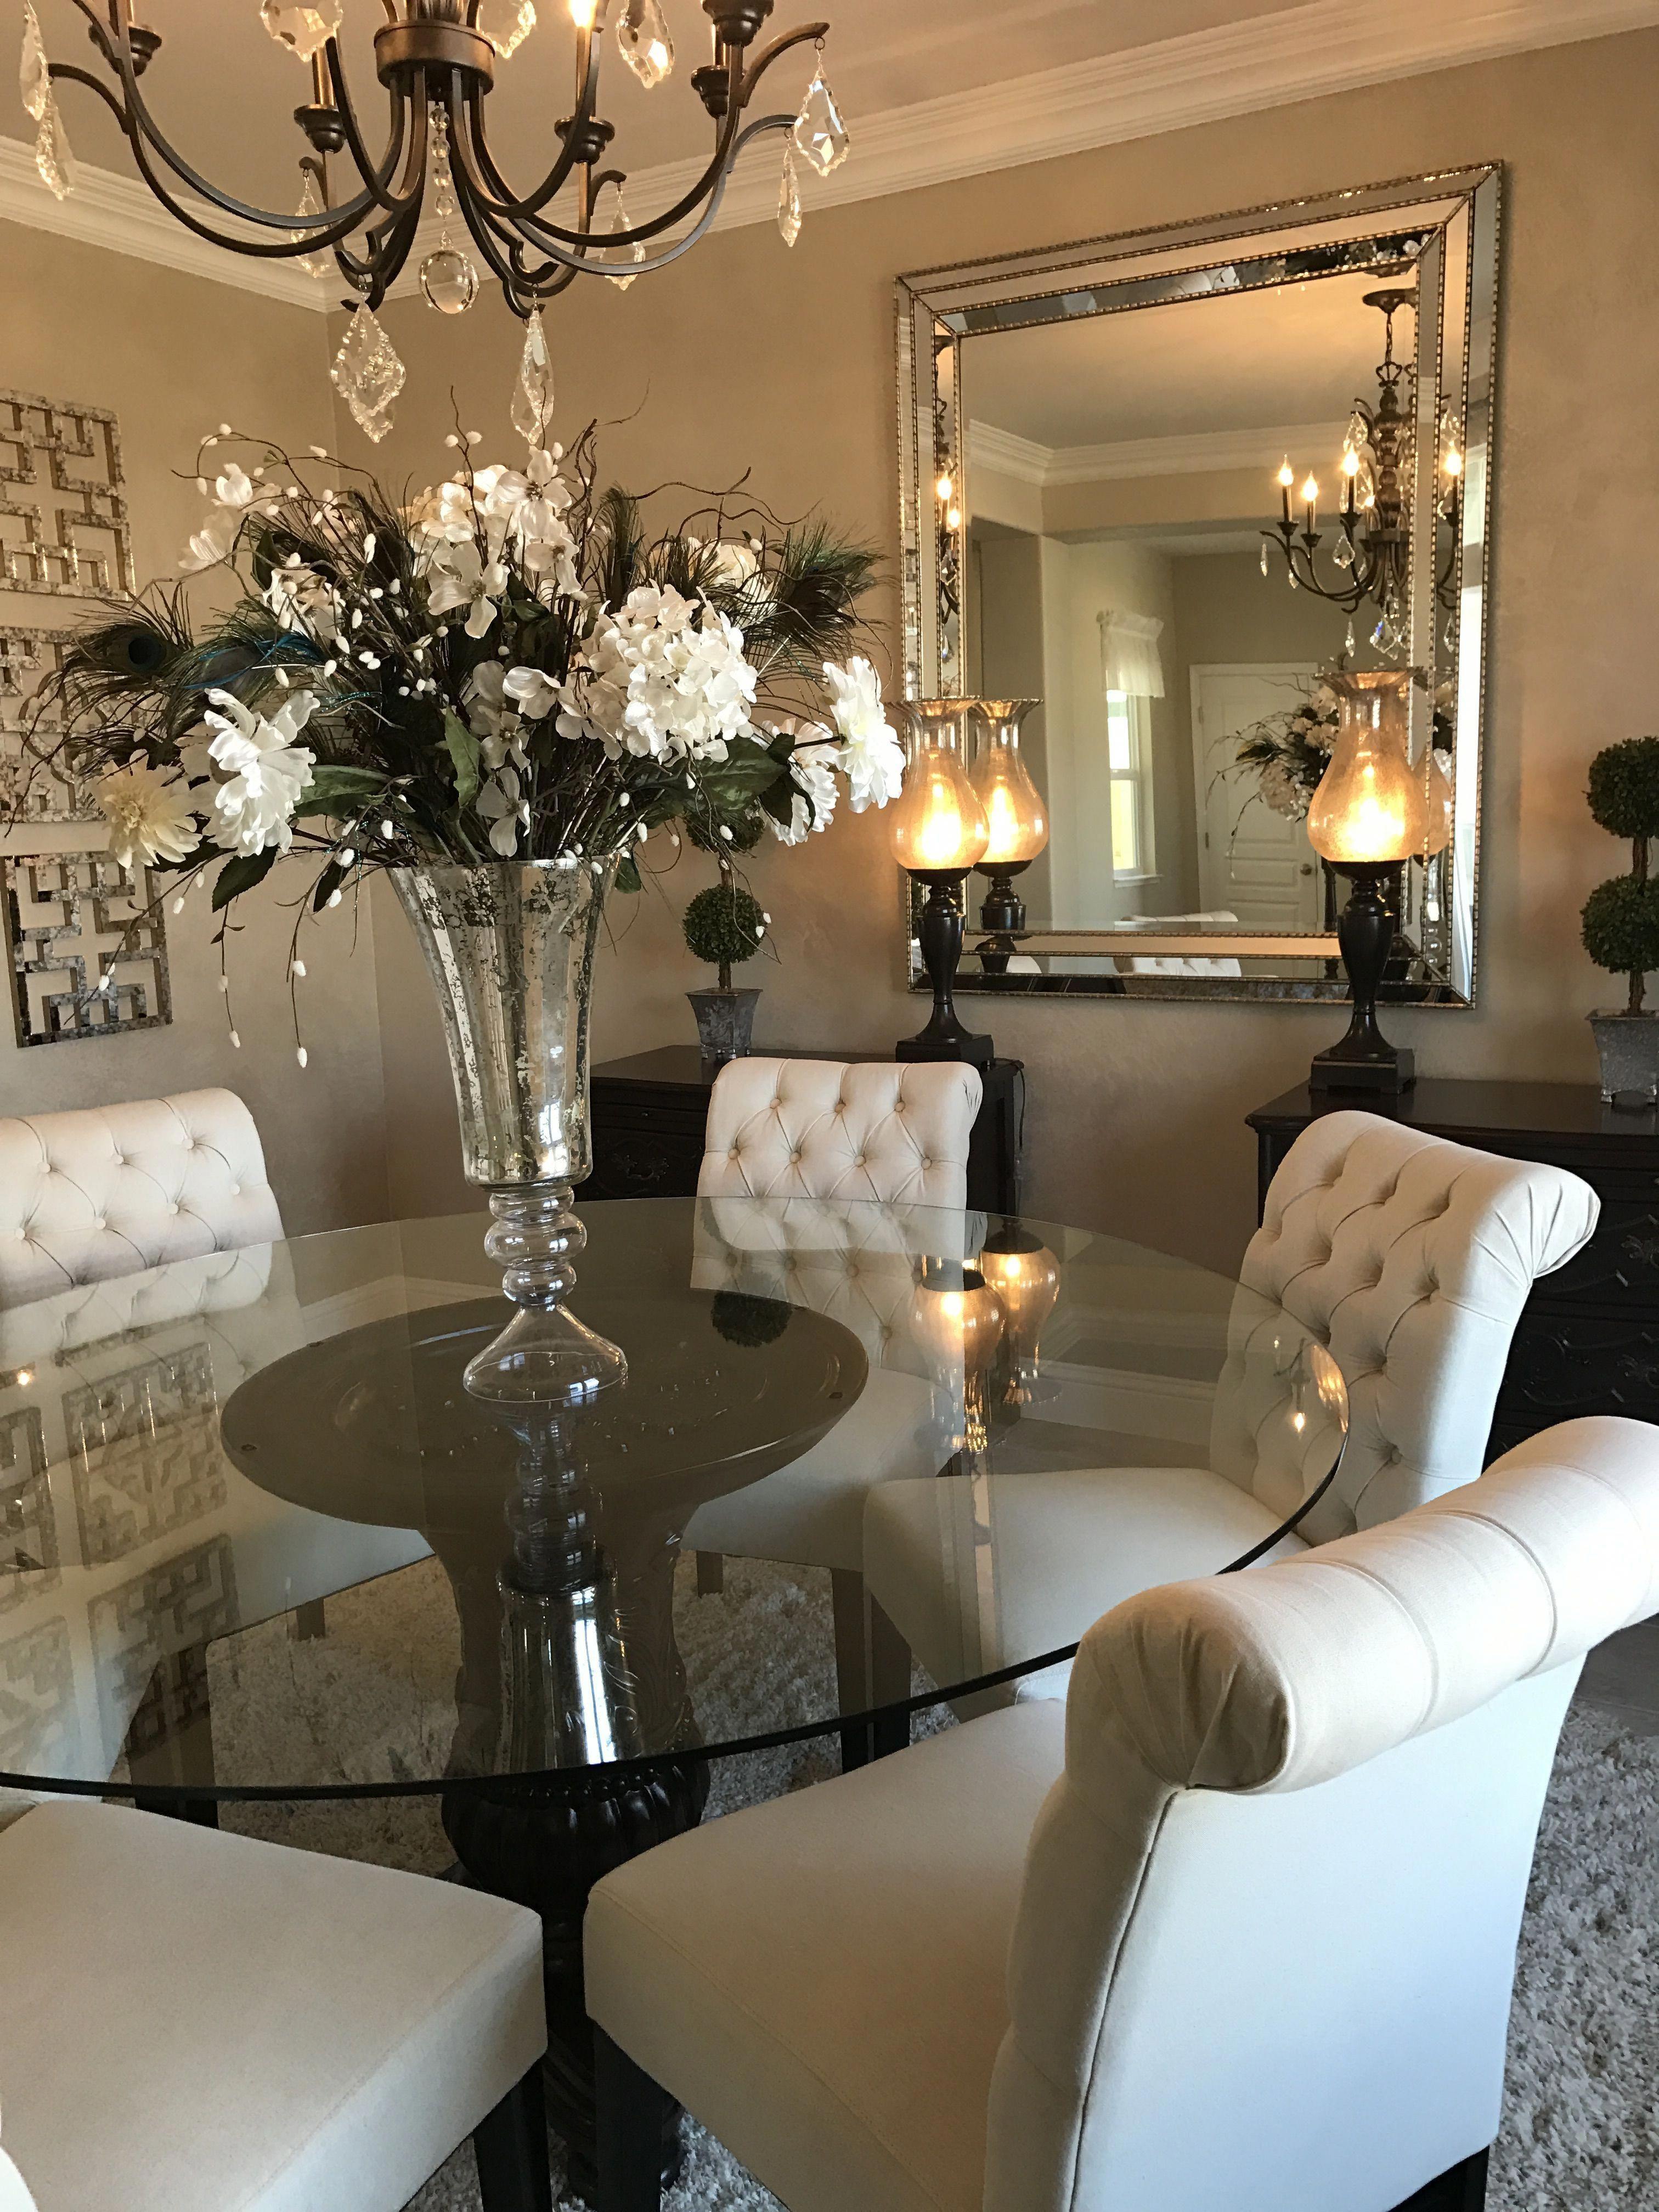 Living Room House Interior Design Living Room Photo Decoration App 20190502 Dining Room Wall Decor Dinning Room Decor Dining Room Design